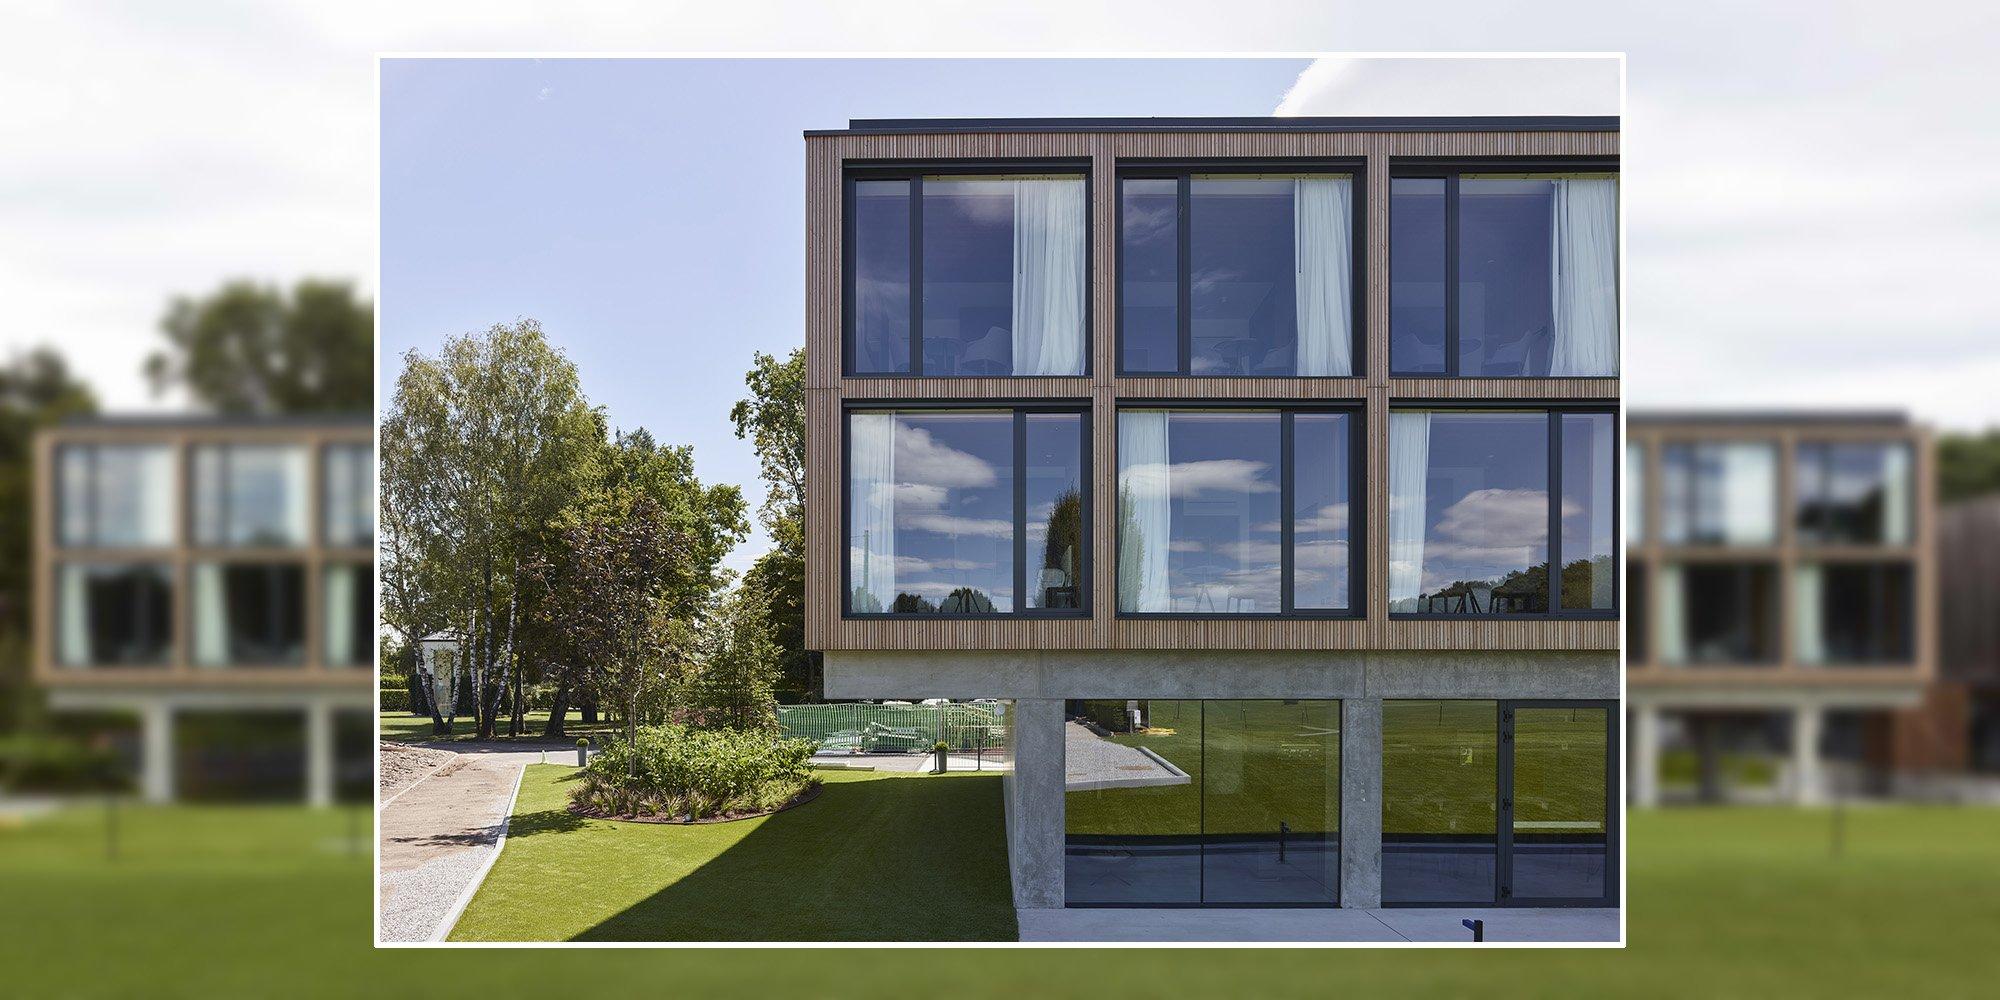 Inter Gets An Innovative New Club House Coima Image